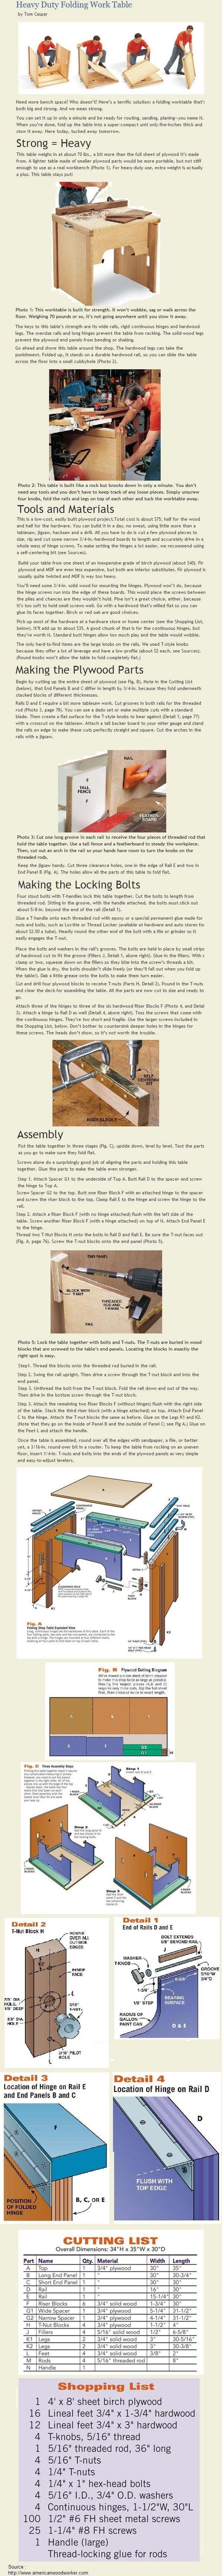 best 25 portable work table ideas on pinterest hand held belt